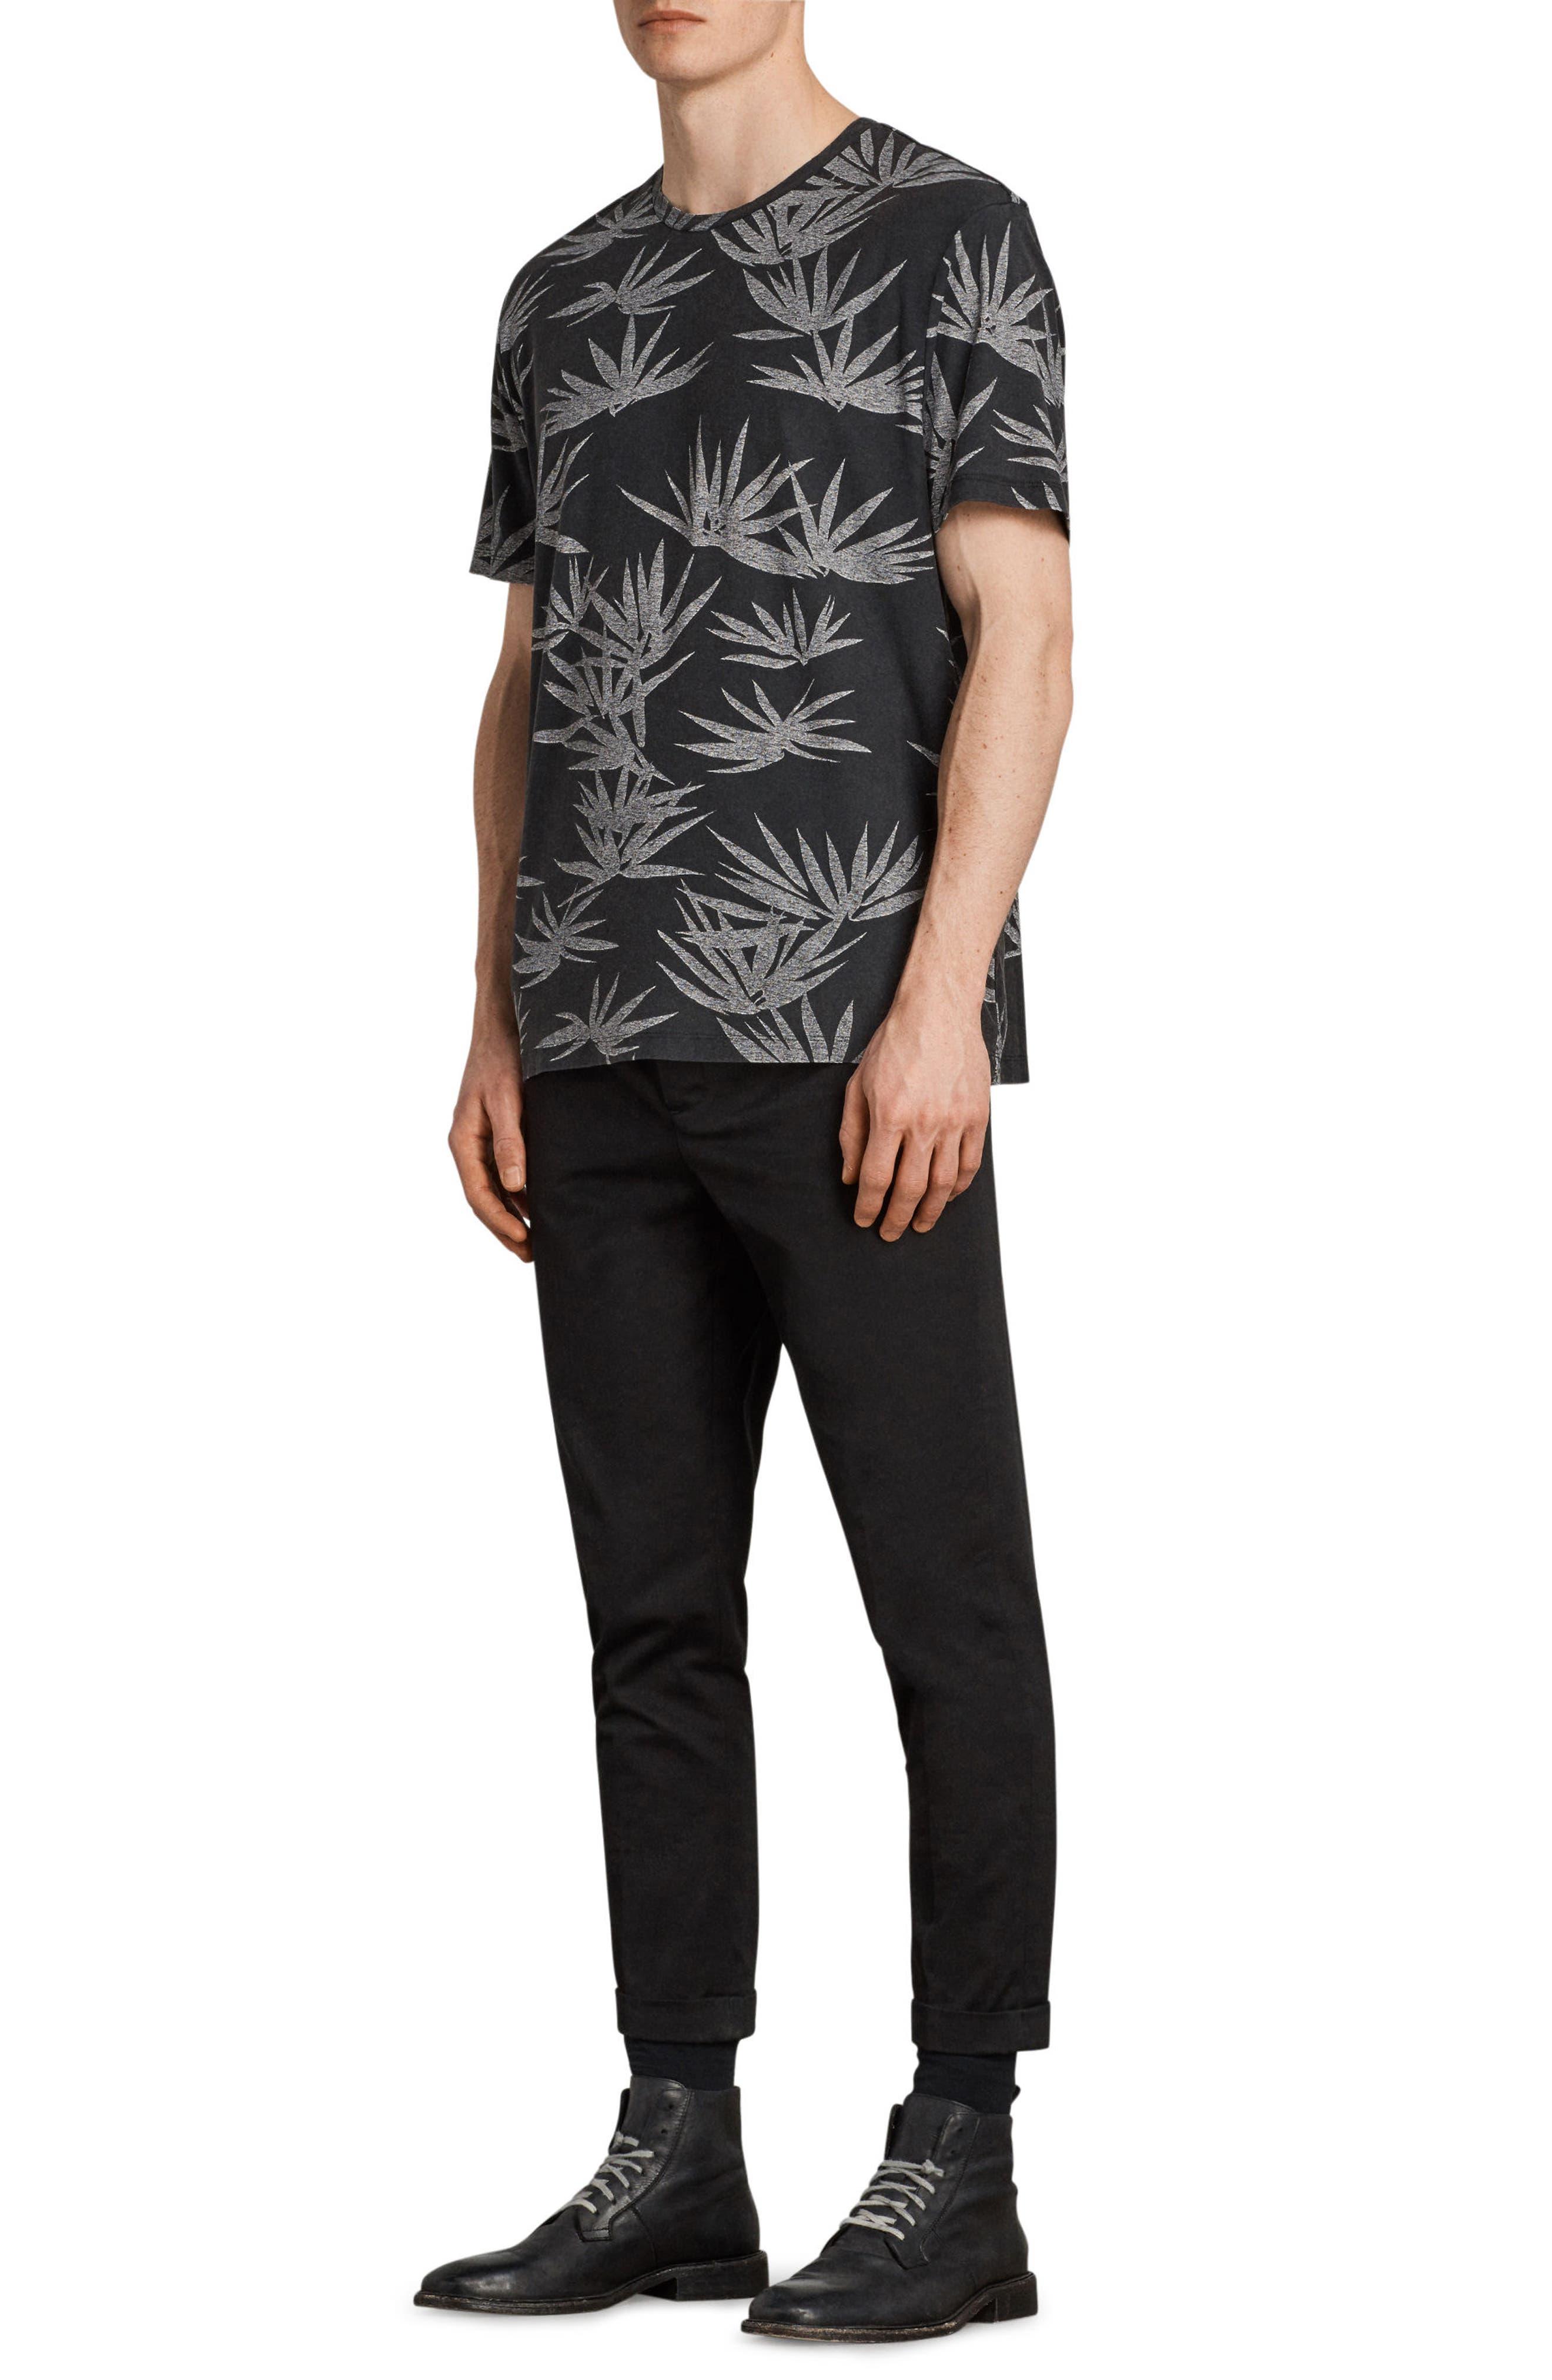 Bhutan Short Sleeve T-Shirt,                             Alternate thumbnail 4, color,                             BLACK